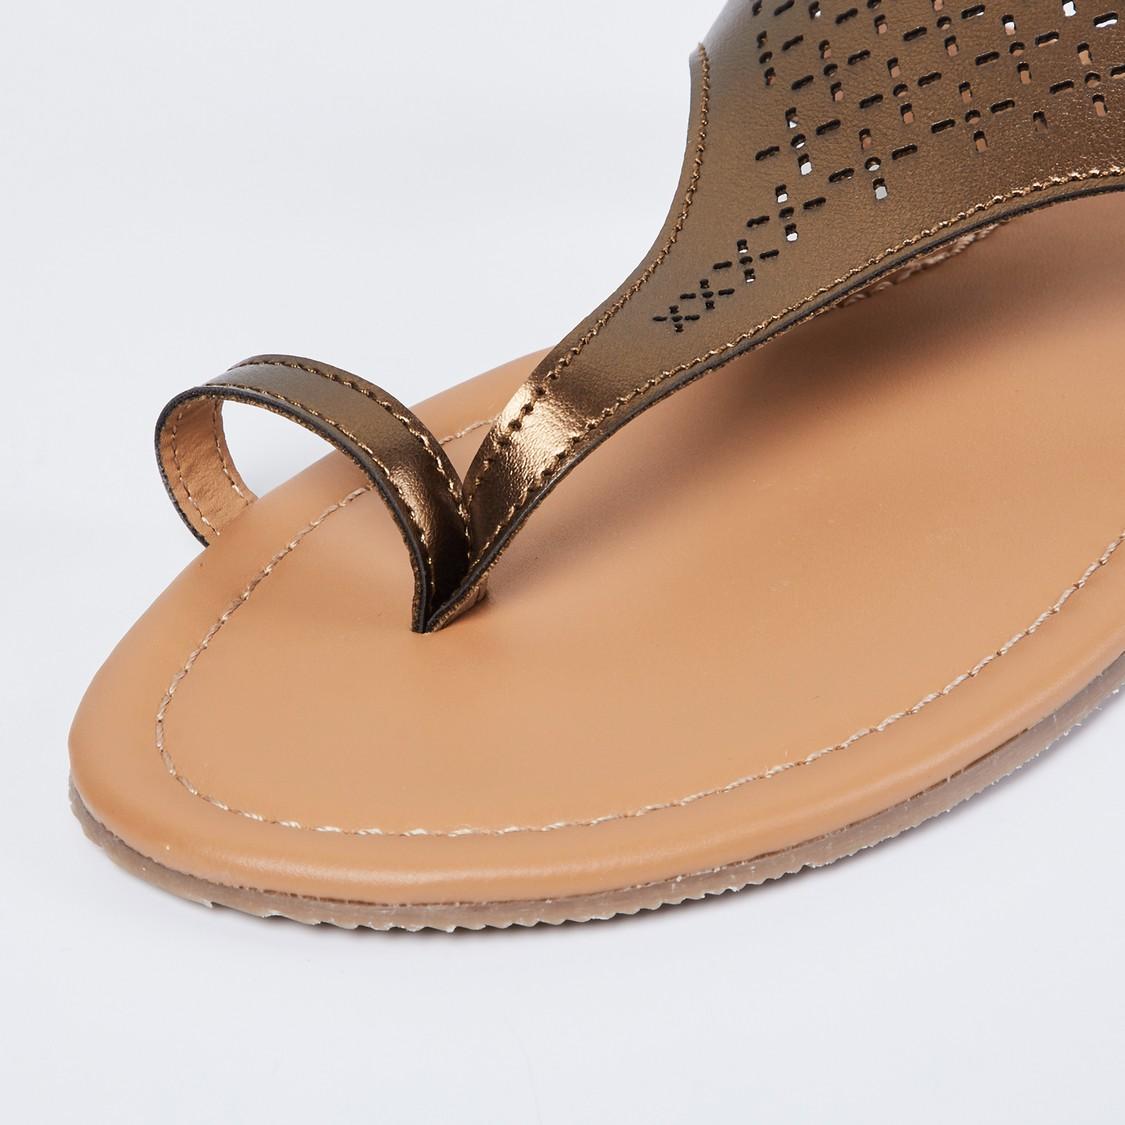 MAX Laser-Cut Toe-Ring Flat Sandals